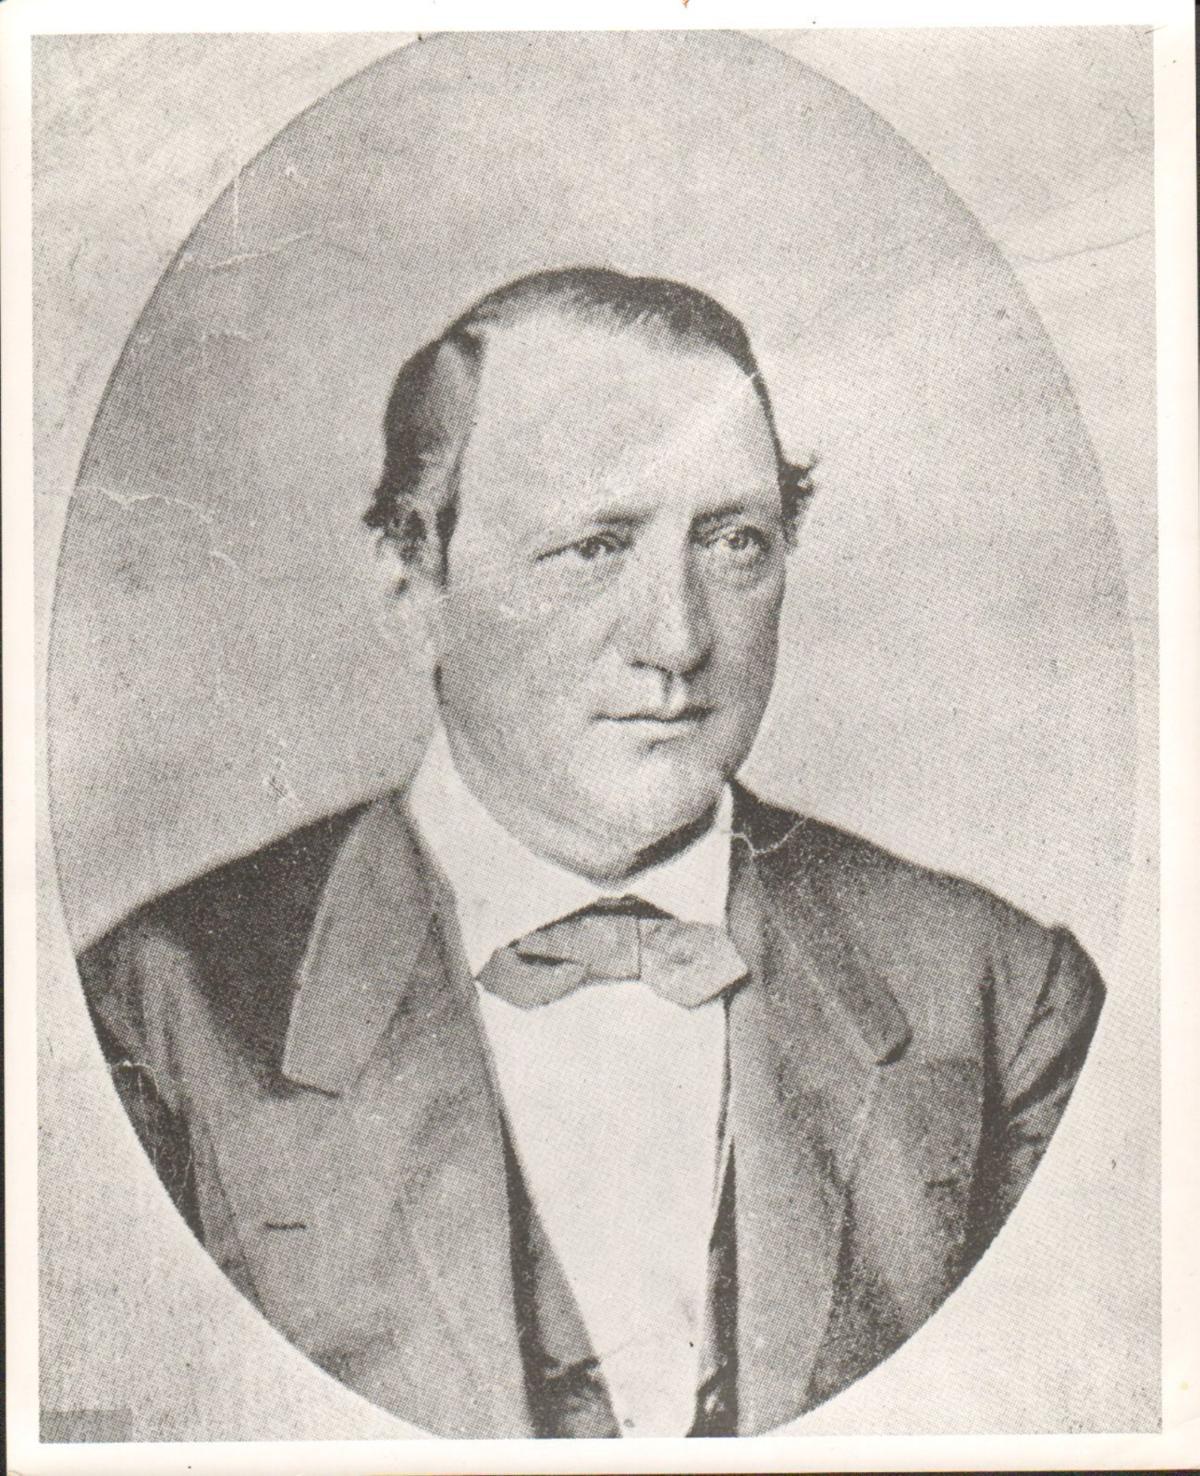 John Carlile portrait